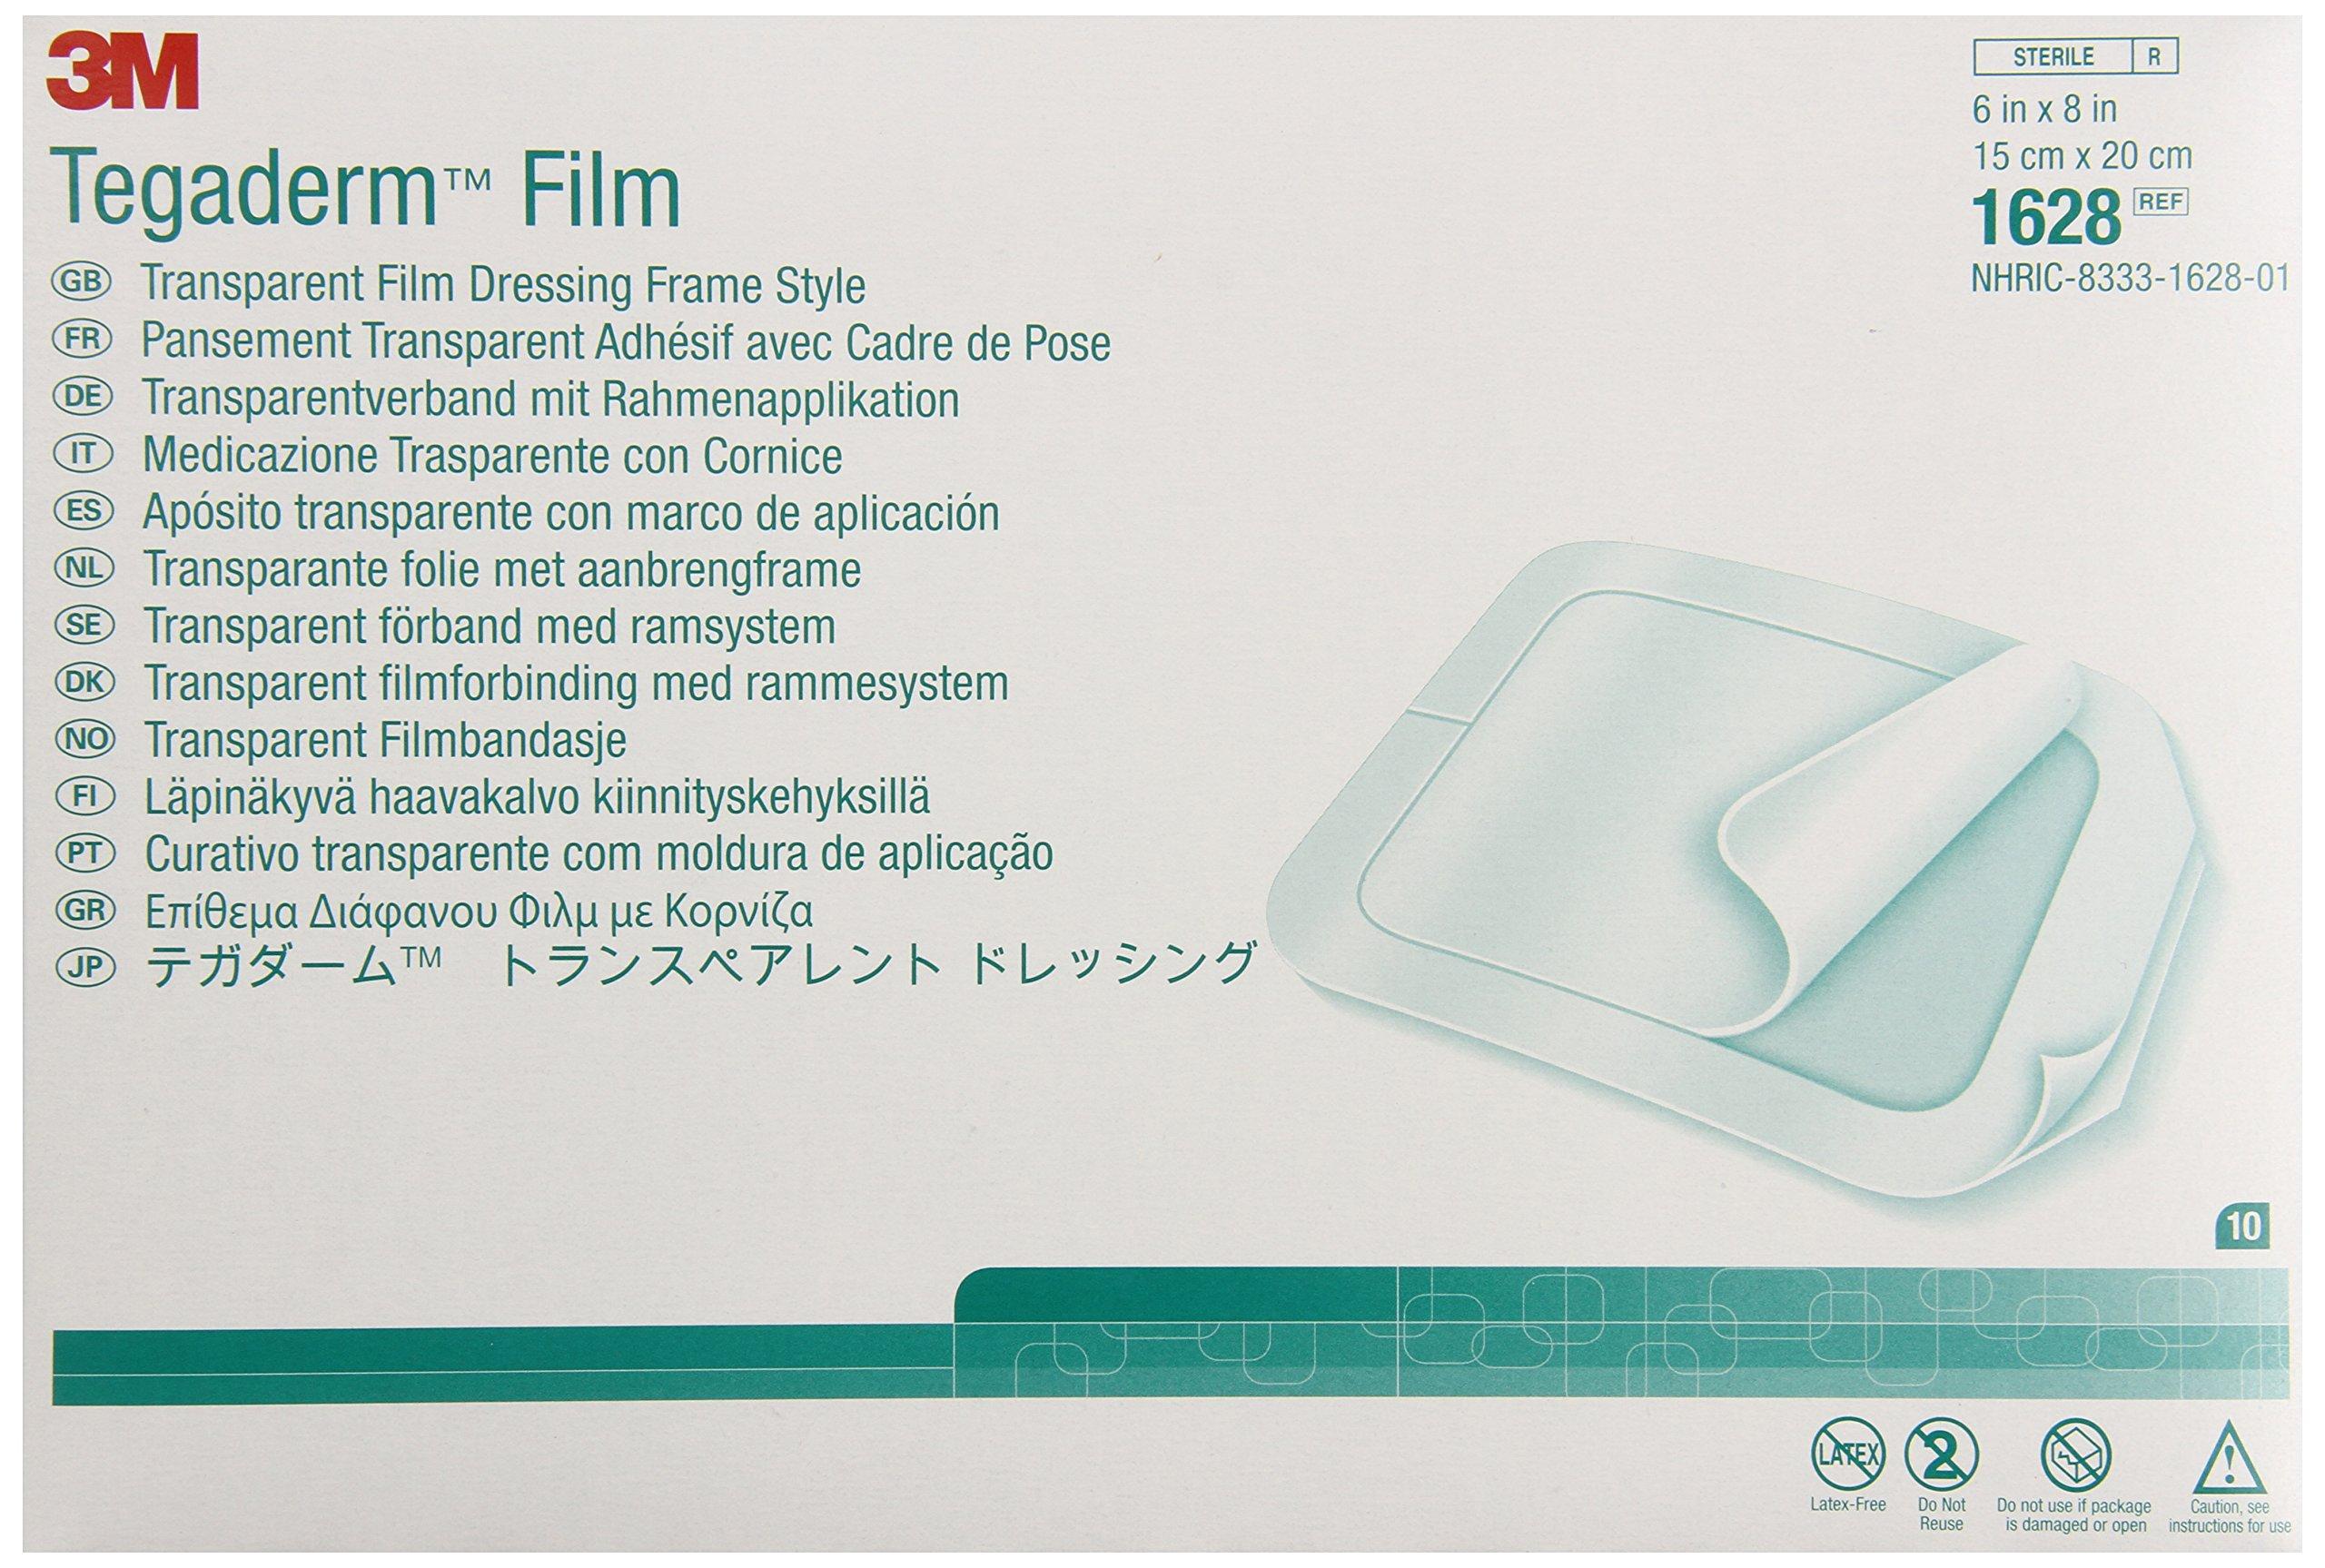 3M 1628 Tegaderm Transparent Film Dressing Frame Style (Pack of 10)